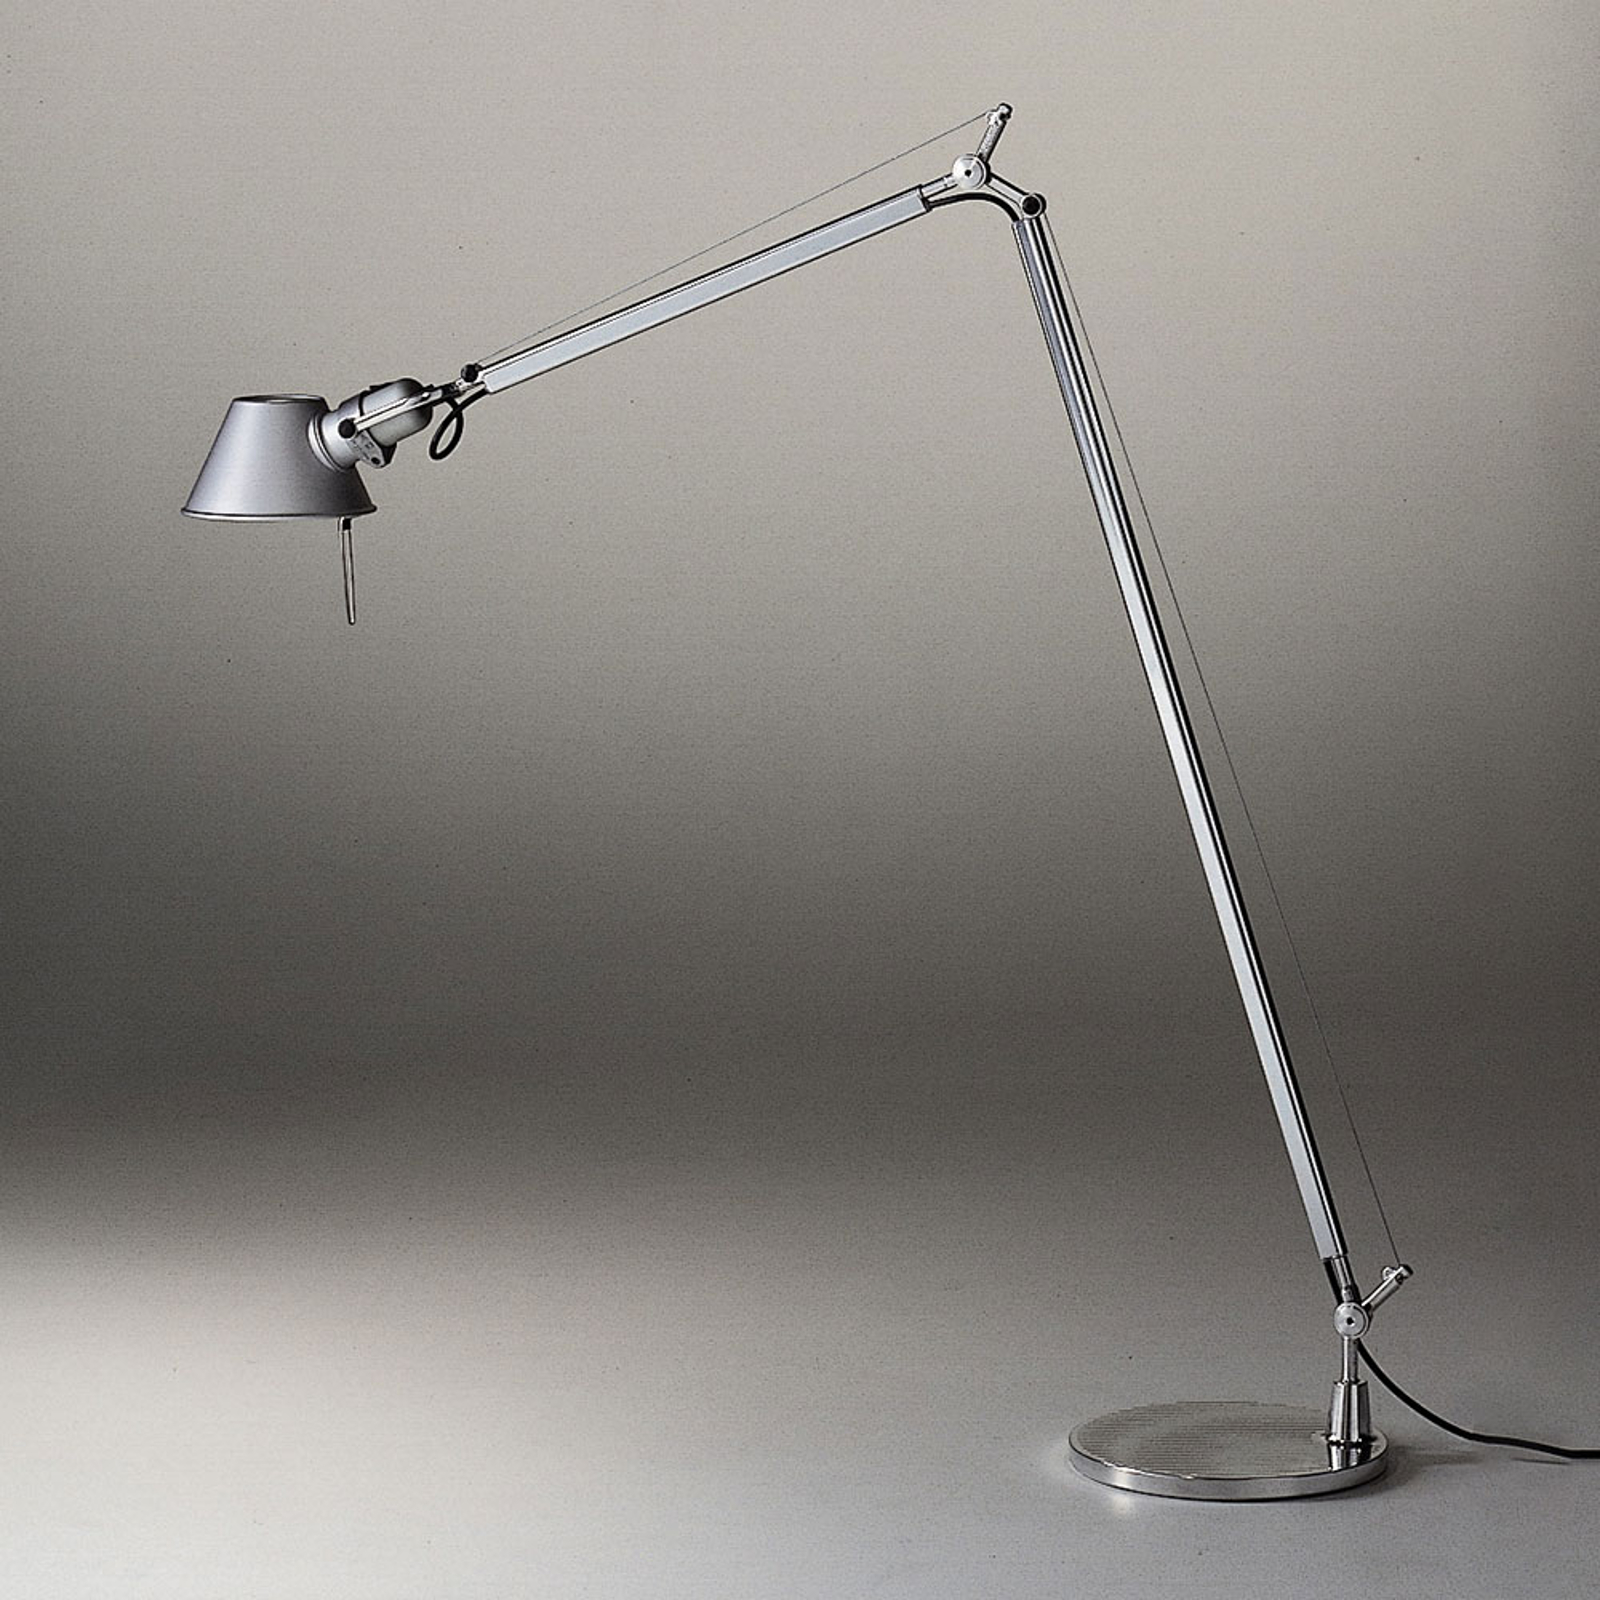 Artemide Tolomeo Reading LED-lattiavalaisin 2700K